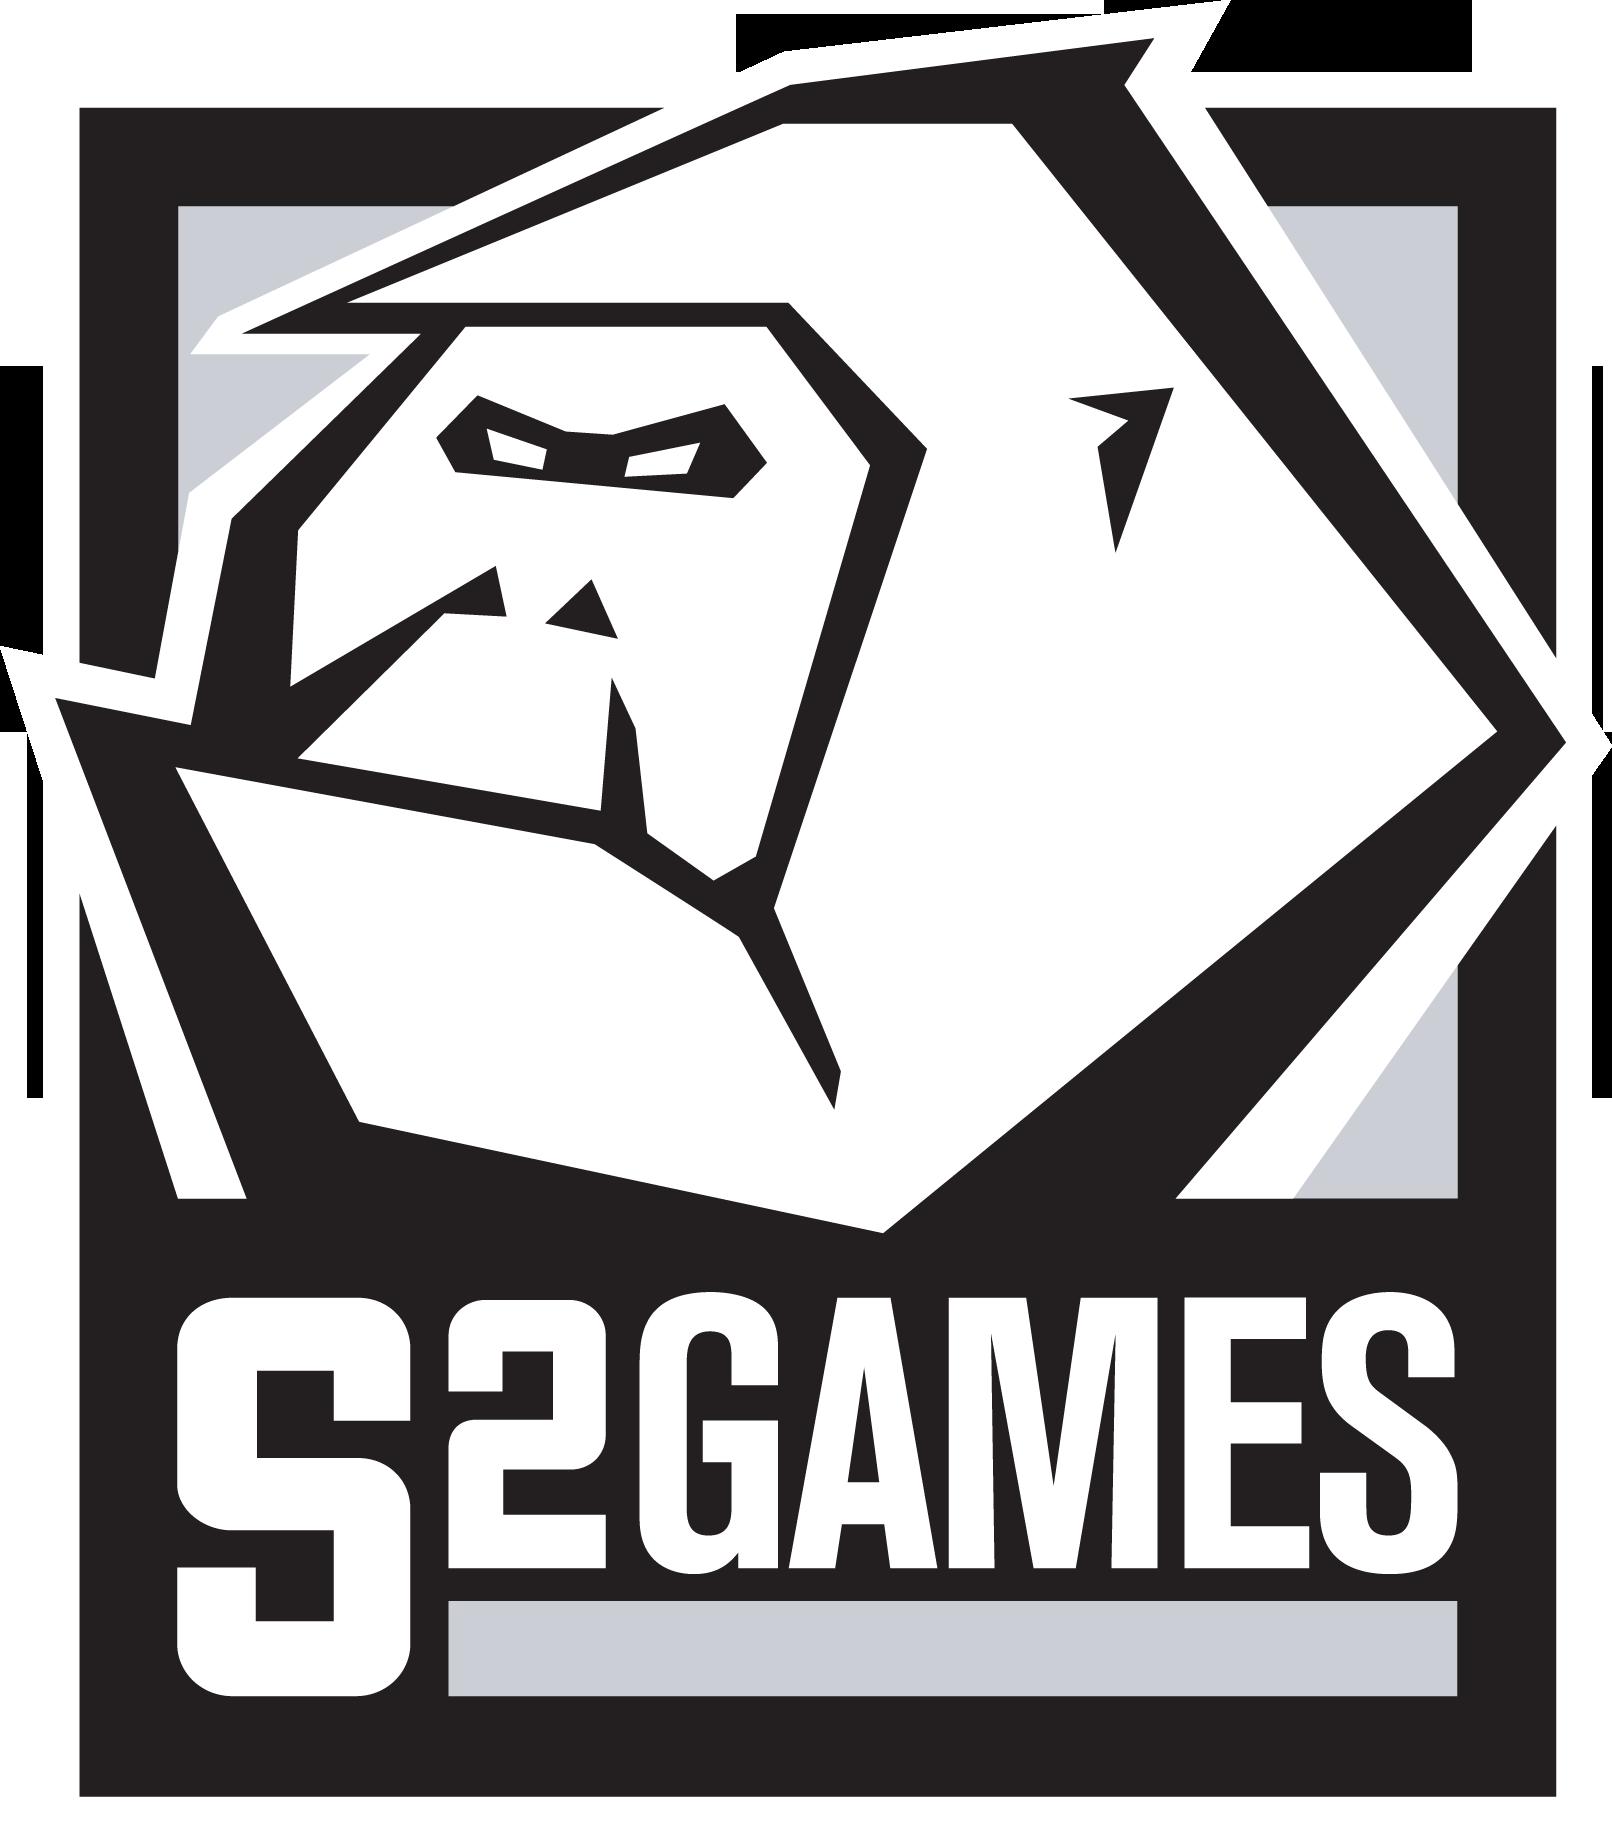 S2 Games, LLC. logo